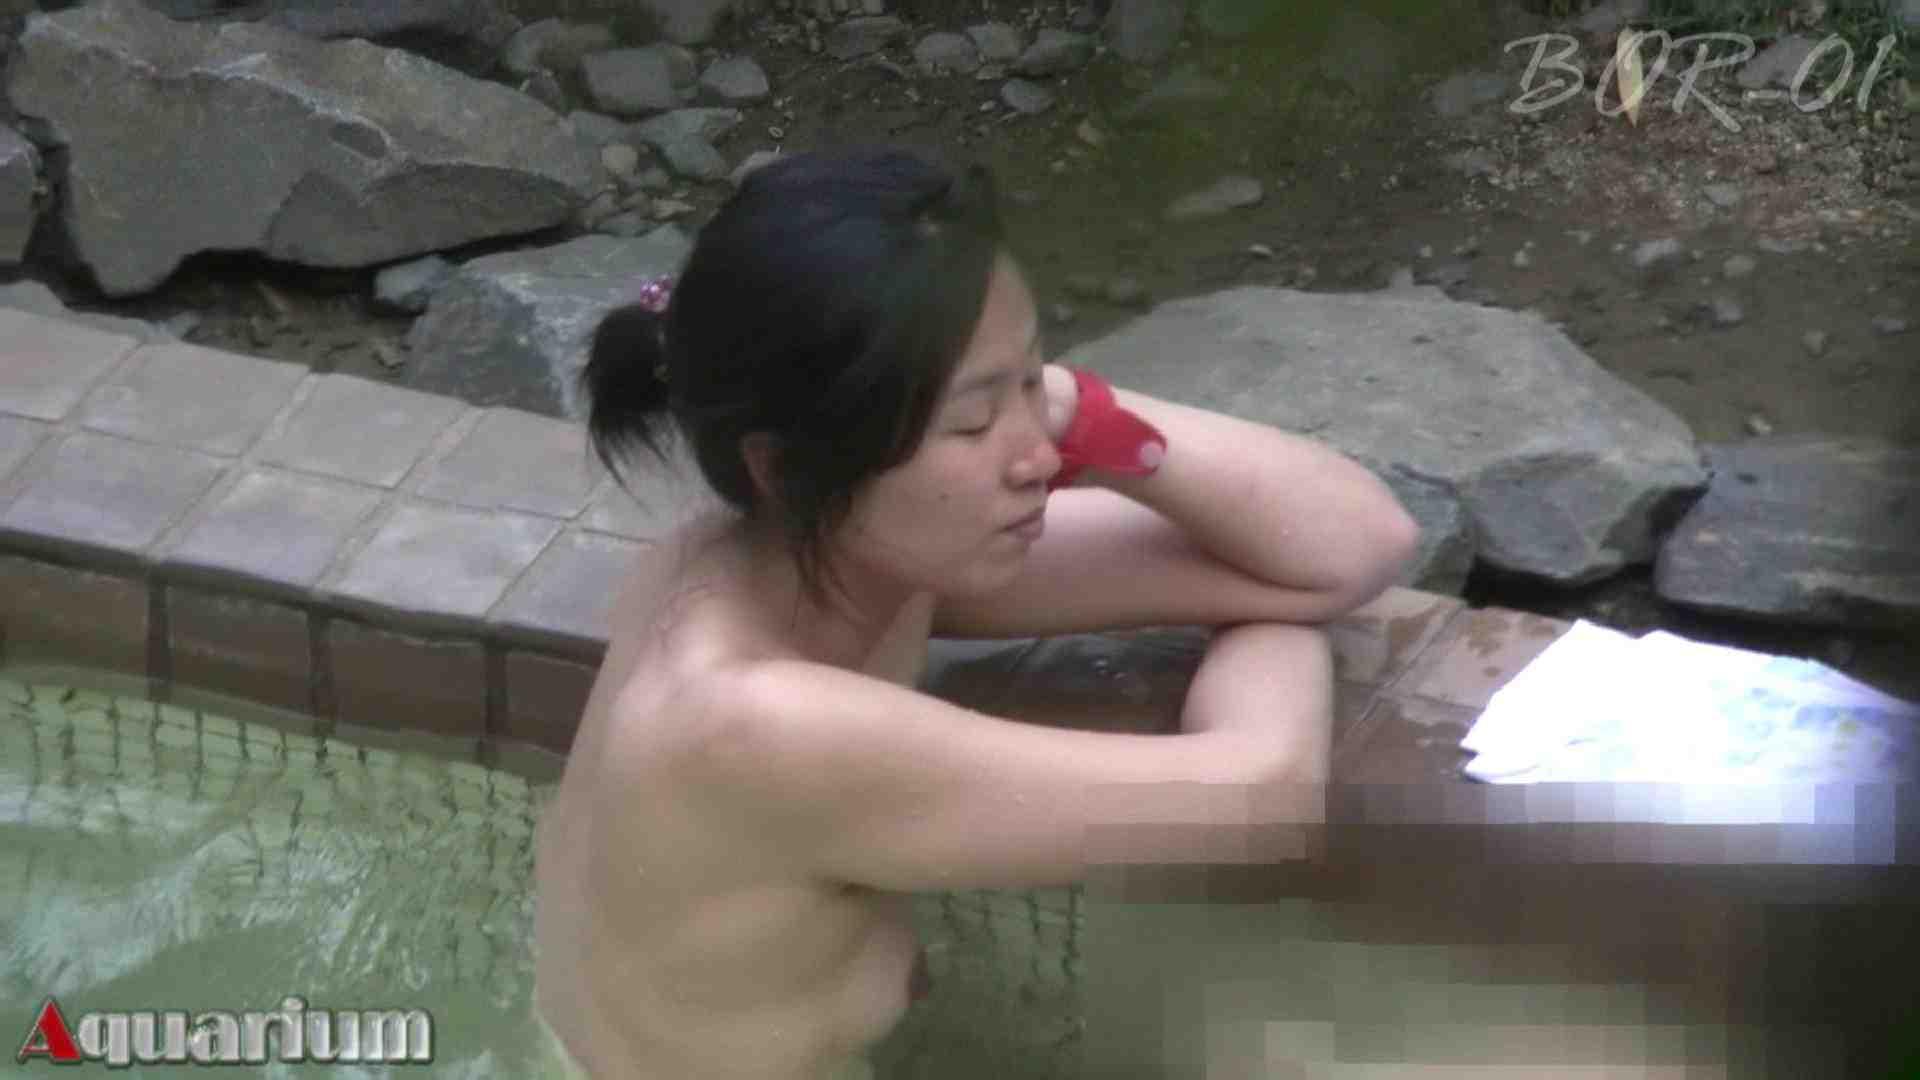 Aquaな露天風呂Vol.465 美しいOLの裸体 おめこ無修正動画無料 103pic 17